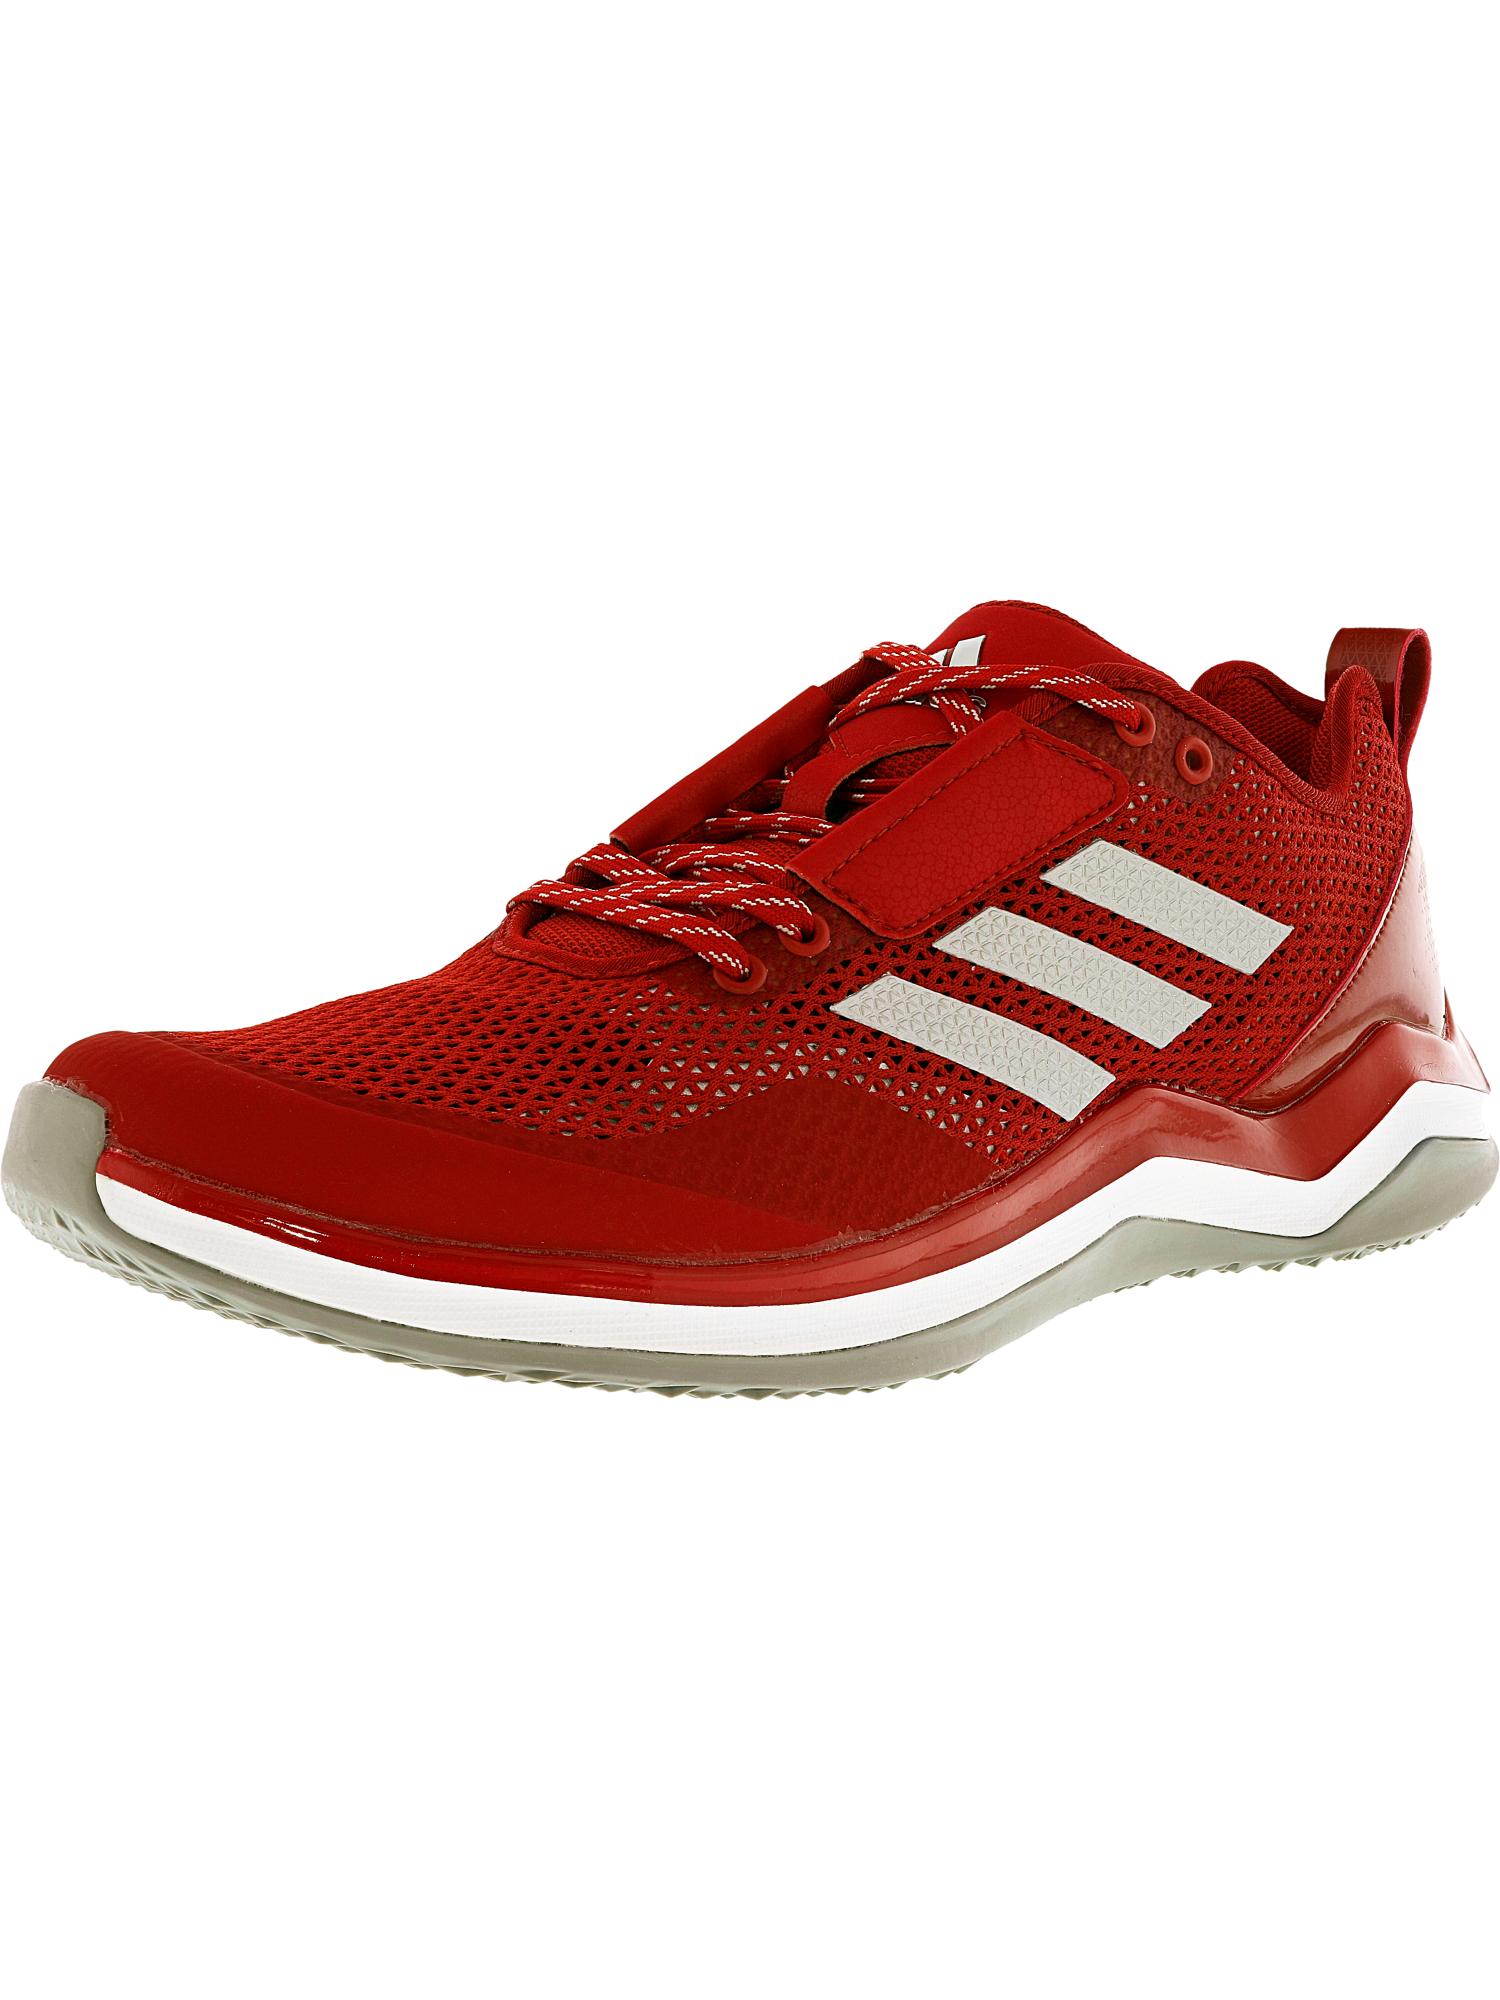 Adidas Men 's Speed Trainer 3.0 Ankle-High Baseball Shoe